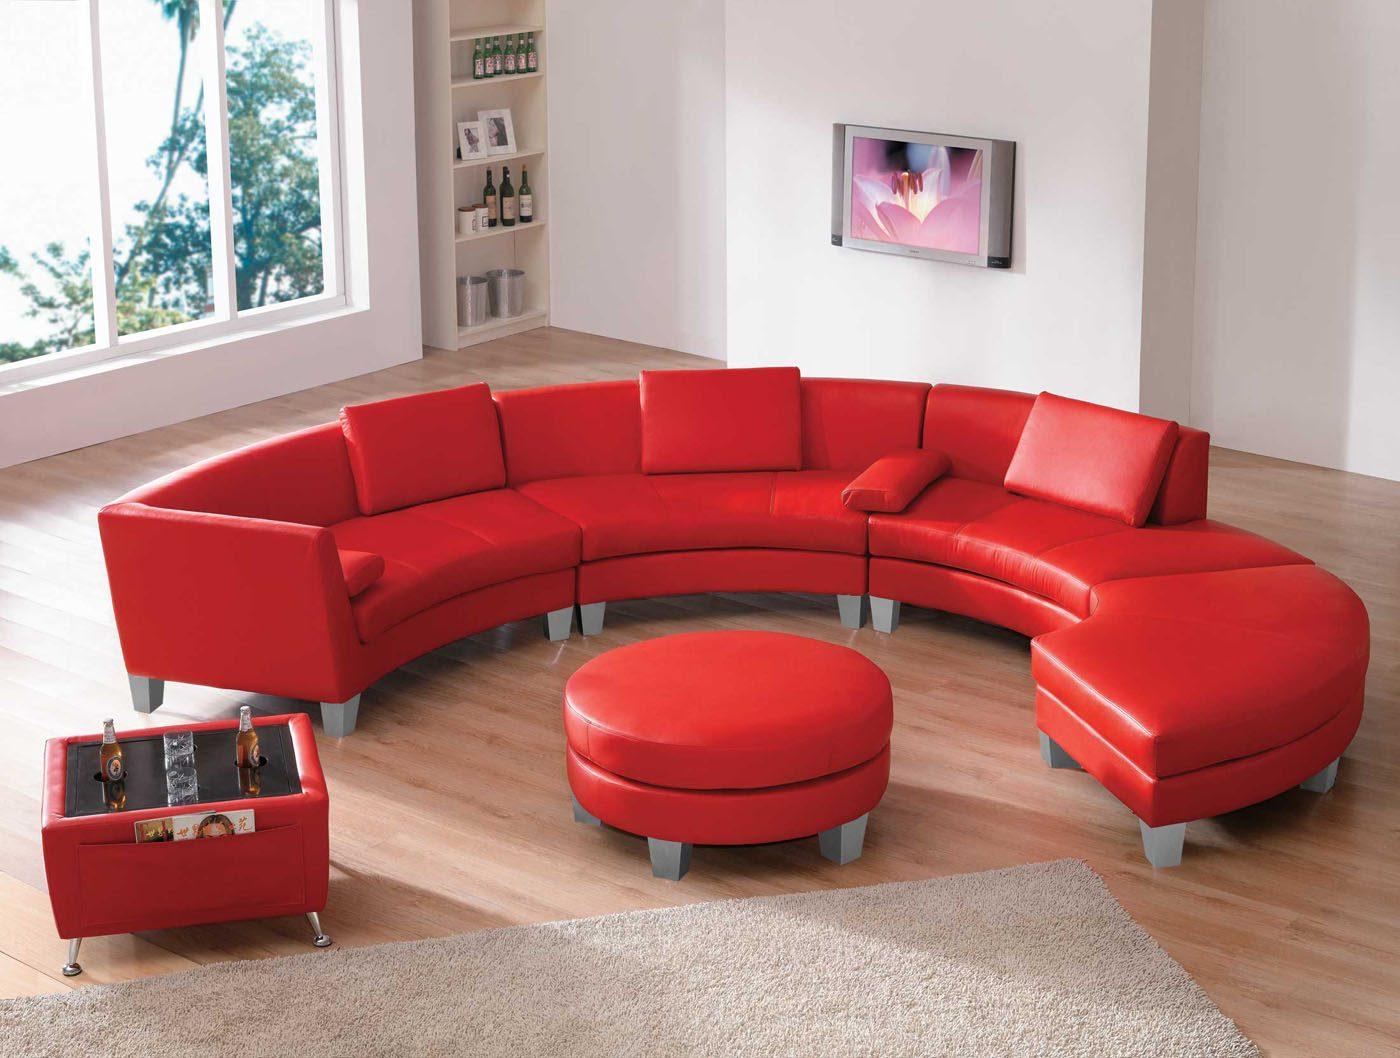 Galer a de im genes muebles modernos para el sal n for Imagenes de sofas modernos